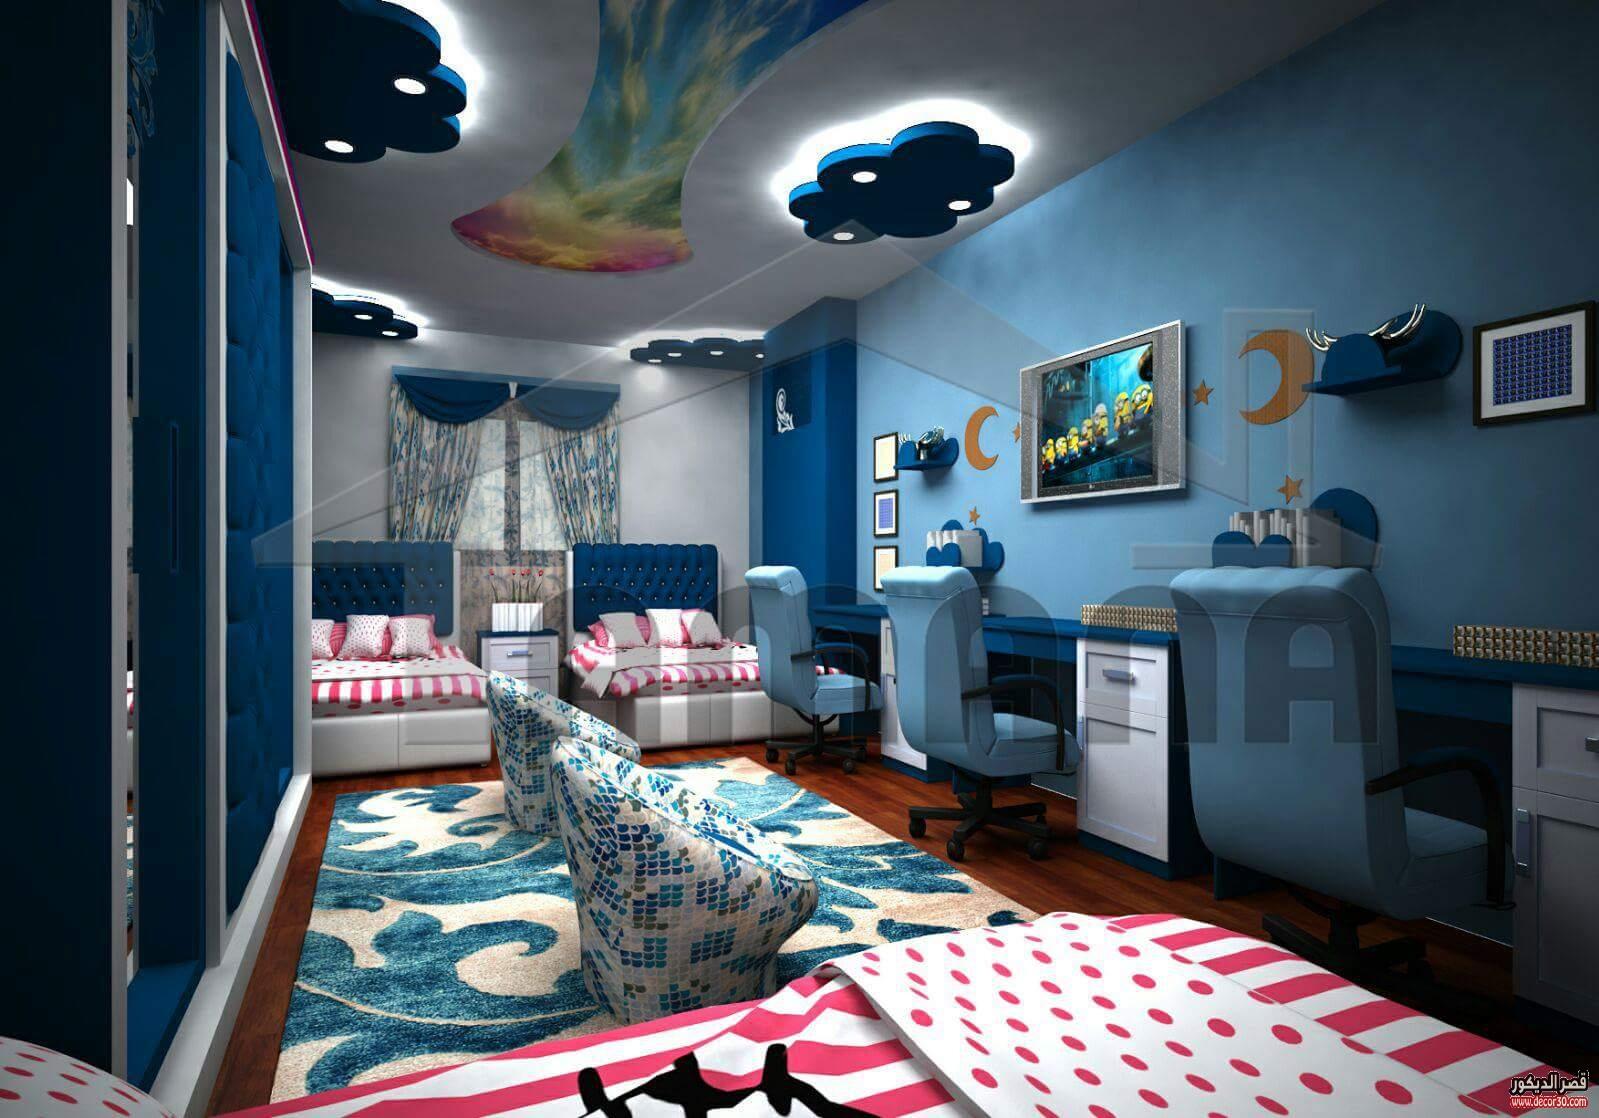 اوض نوم اطفال اولاد مودرن كاملة غرف نوم اولاد شباب قصر الديكور